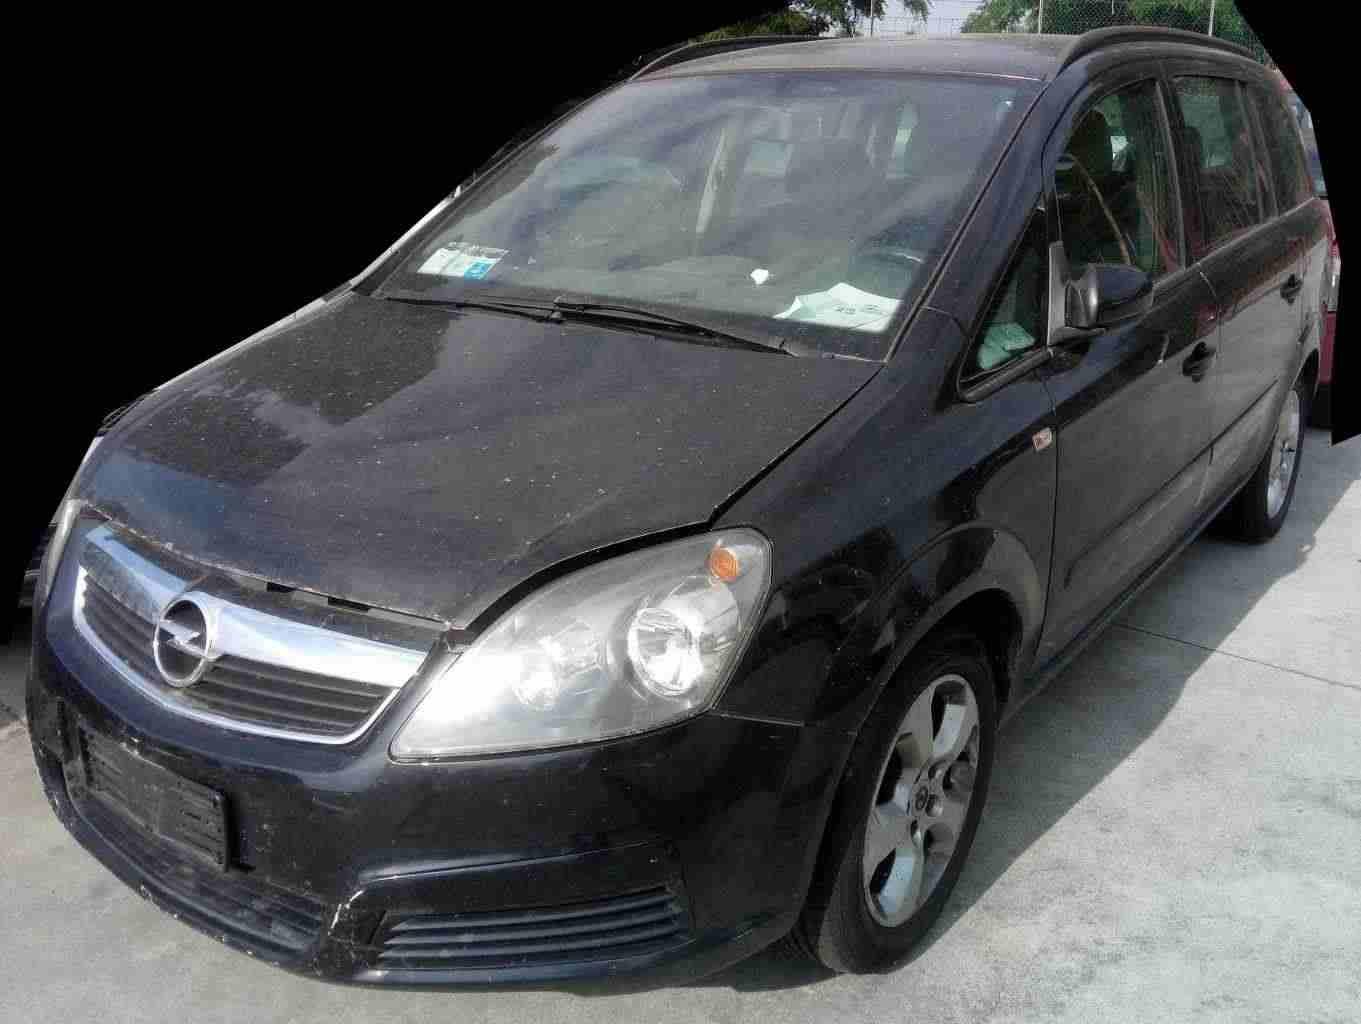 Pezzi per Opel Zafira B 1600 anno 2007 Z16XEP